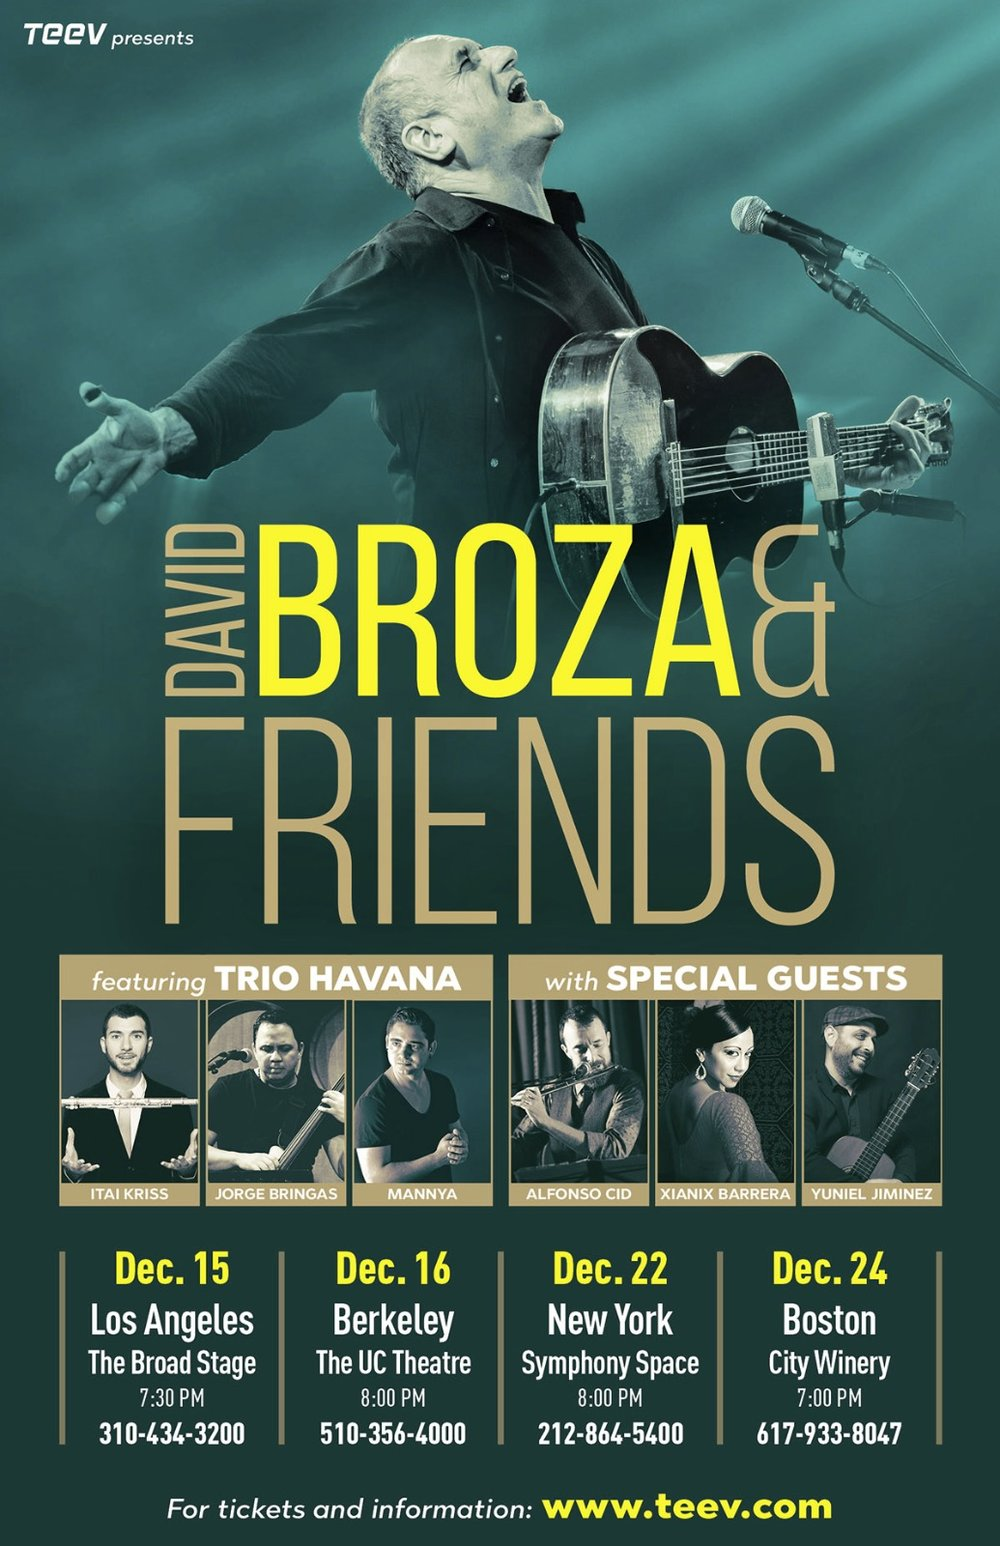 NYC: December 22nd - 8:00 pmSymphony Space - DAVID BROZA AND FRIENDS TOURFeaturing Trio HavanaAlfonso Cid & Xianix Barrera